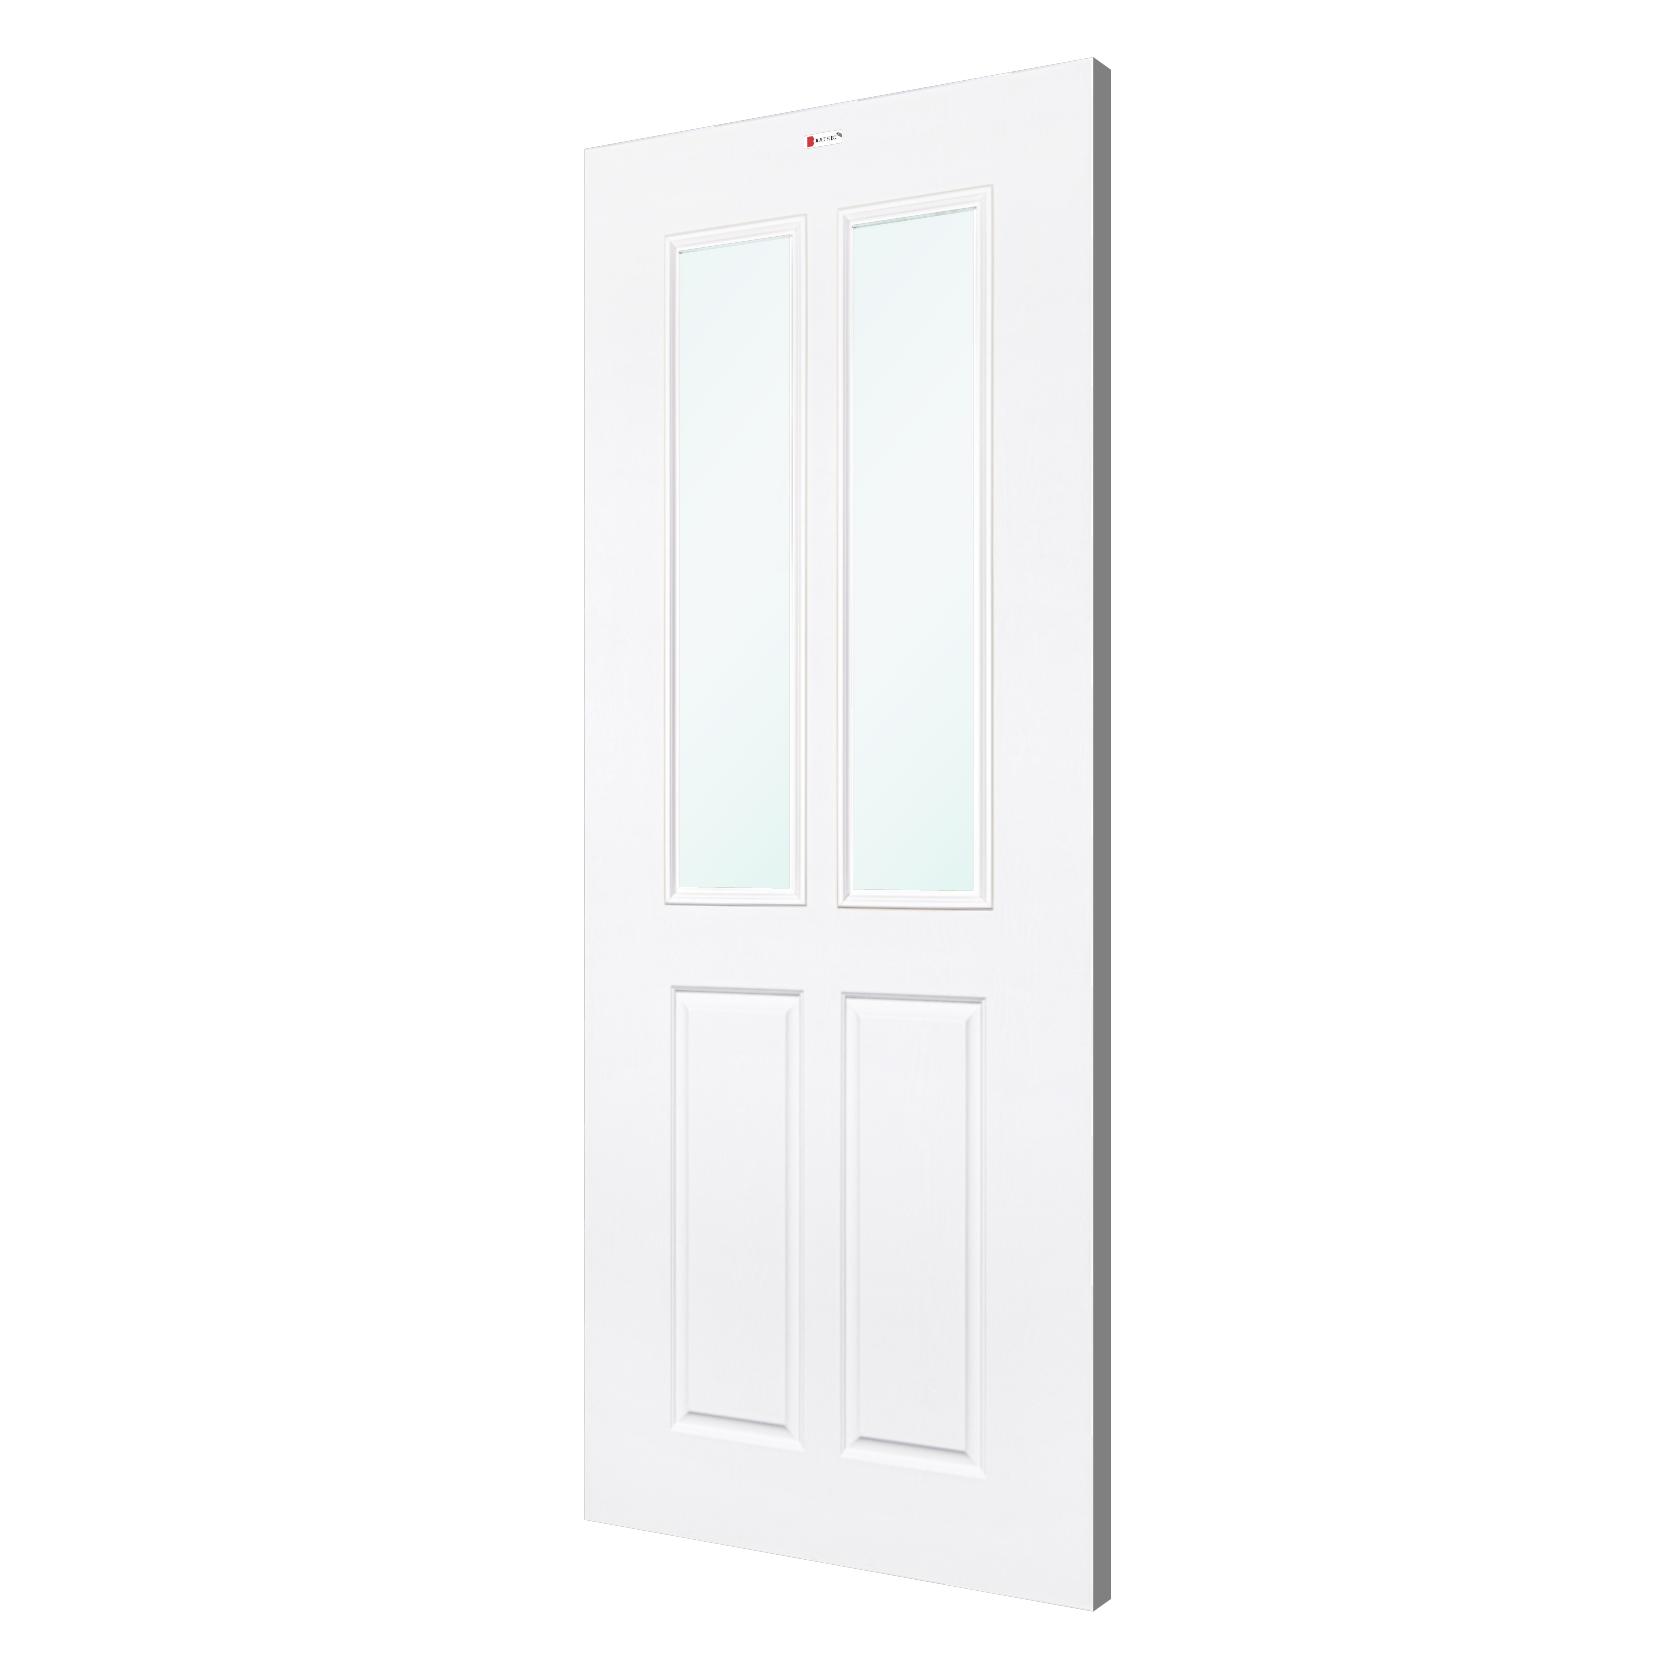 door-upvc-bathic-btg205-white-2